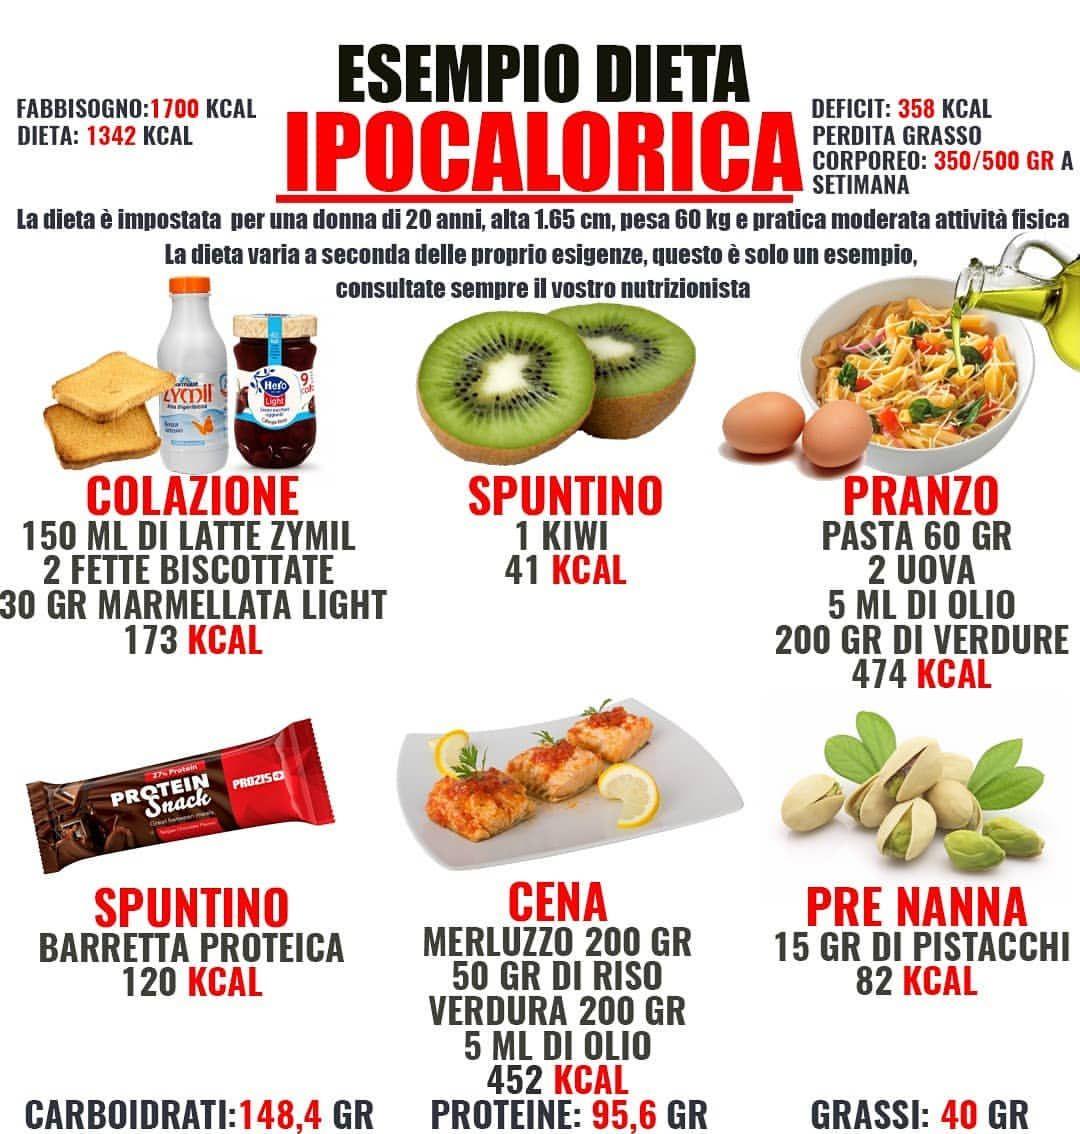 esempi di pranzi dietetici